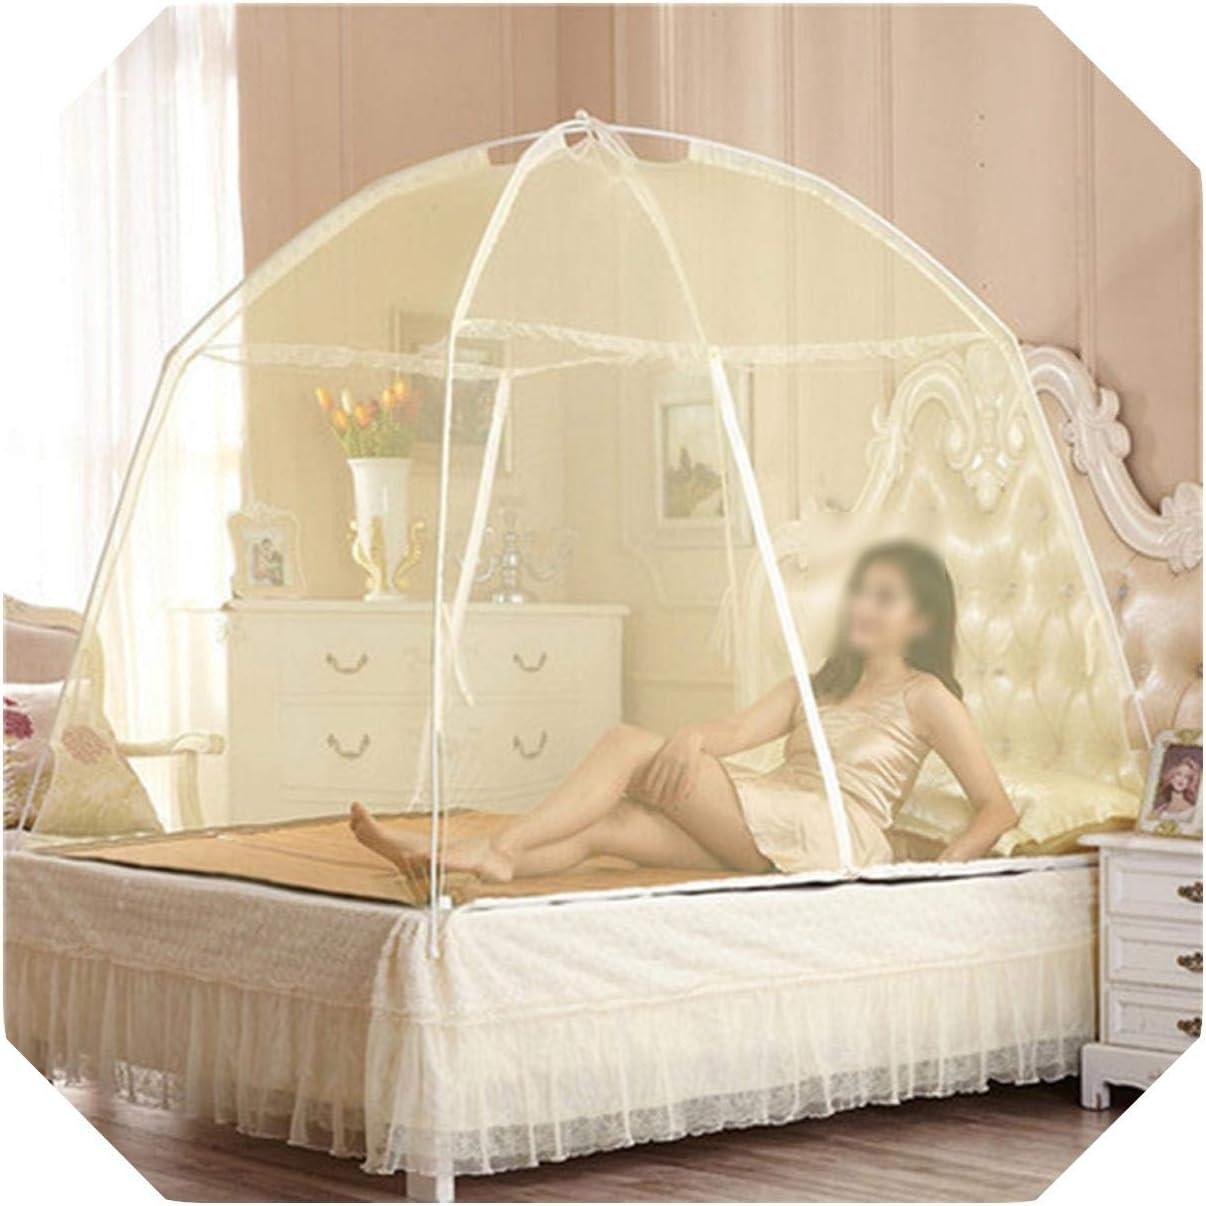 Eileen Ford Malla Mosquitera   Nuevo Verano Doble Puerta yurta mosquitera Plegable Anti Mosquitos Moda mosquitera 100x200cm / 120x200cm / 150x200cm / 180x200cm-rojo-60x120cm niño